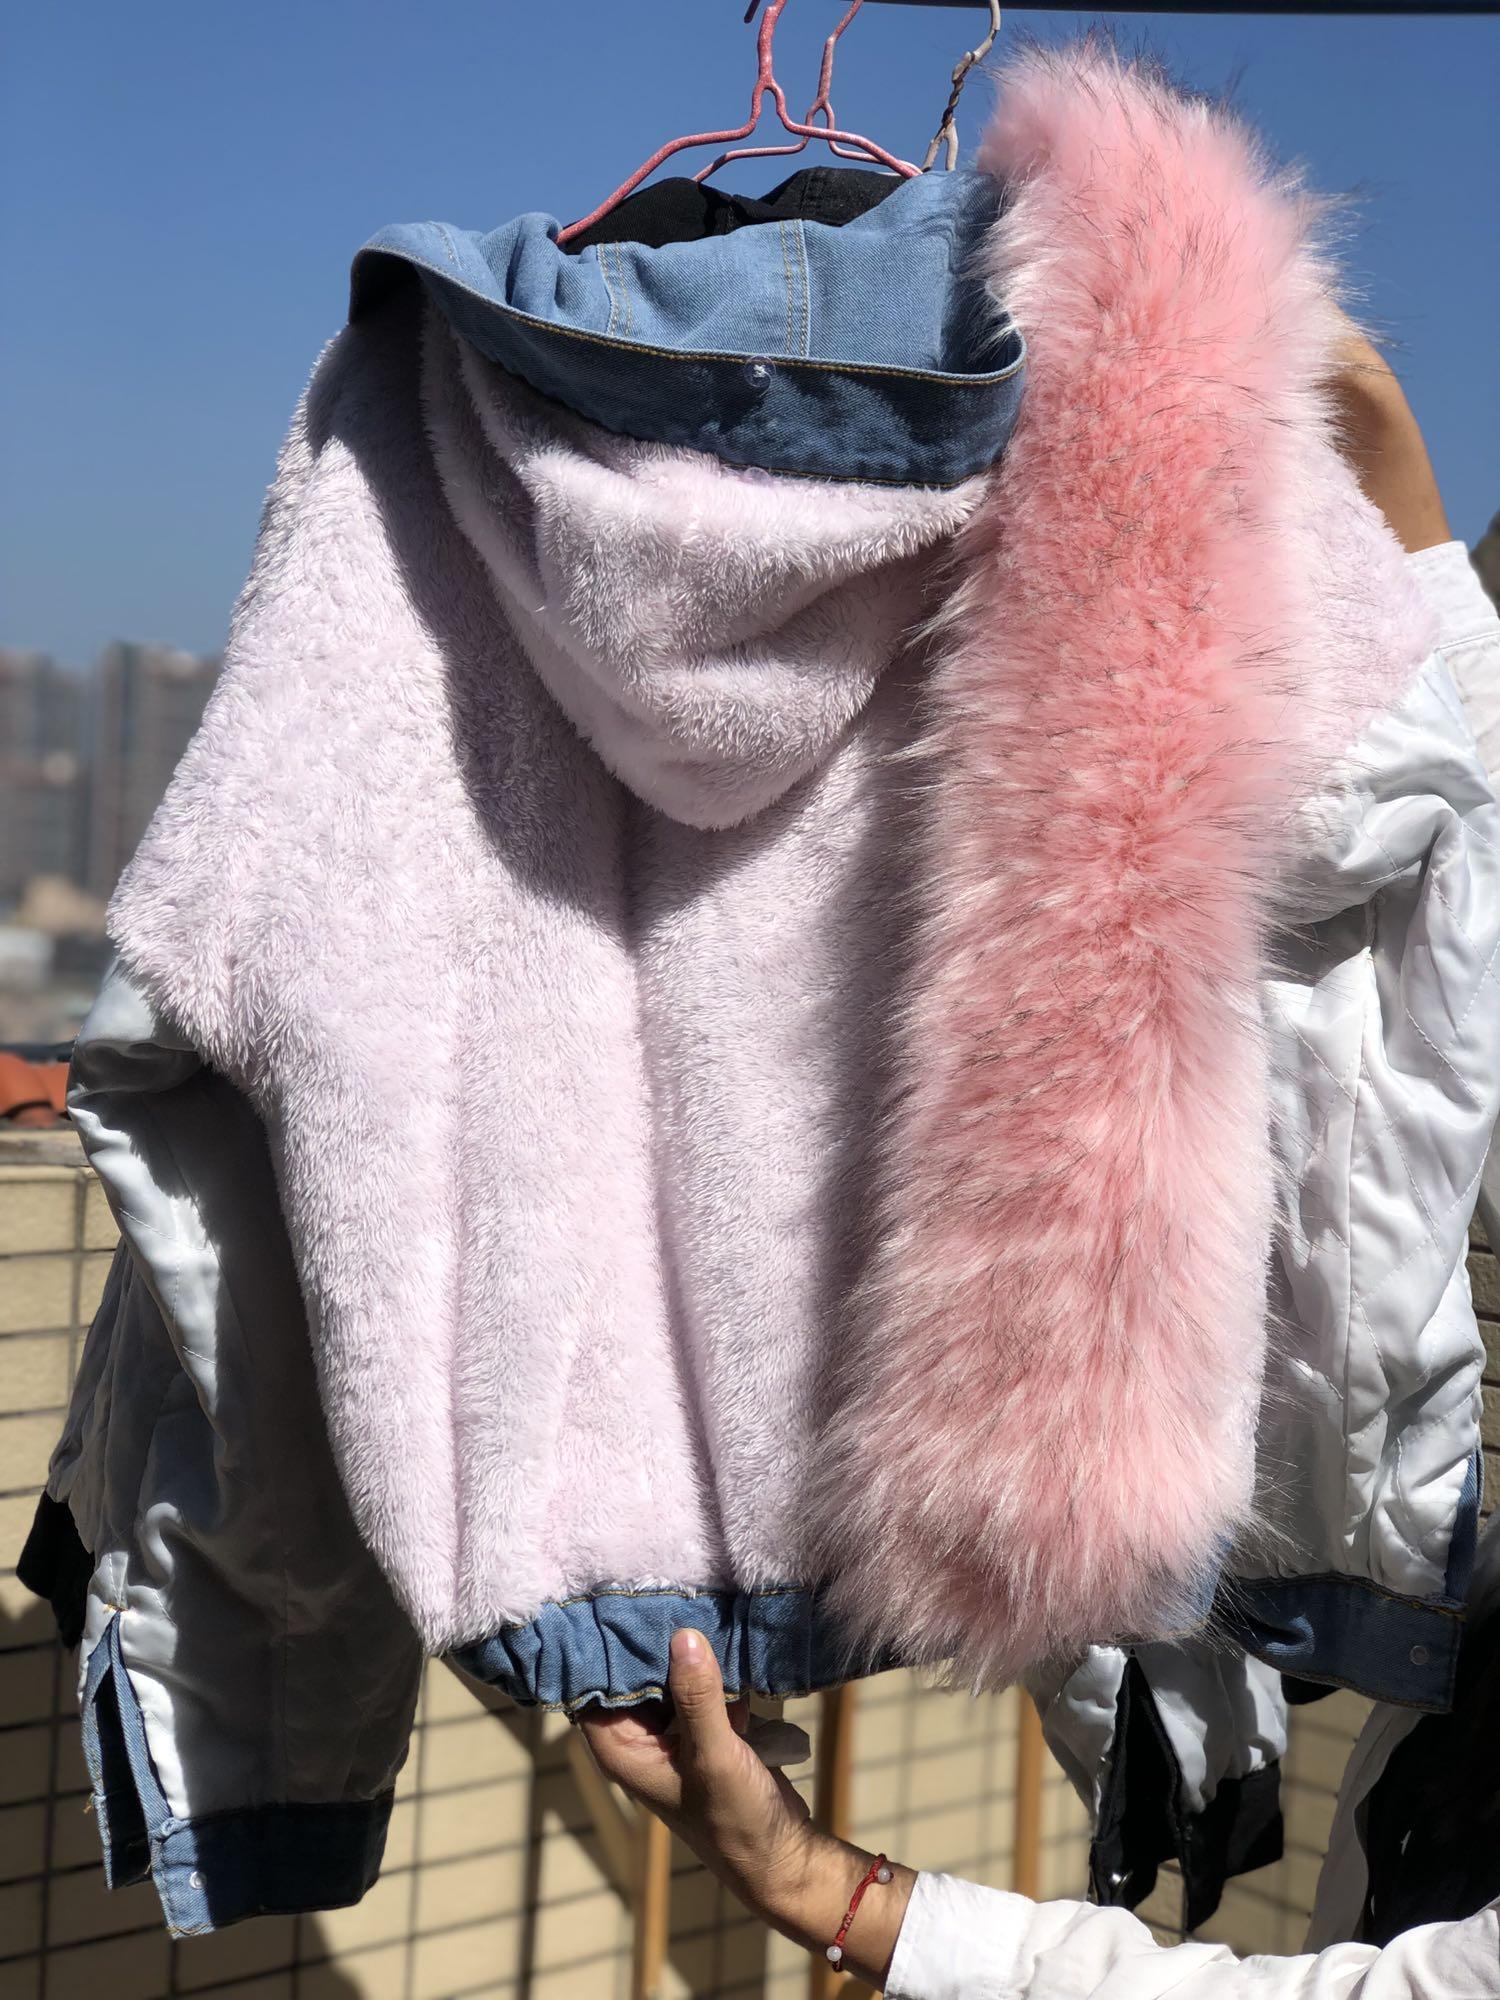 H2d7cb69a3c7f4b16b989c575b1f0f974z LUZUZI 2019 New Warm Winter Bomber Women Winter Autumn Hooded Girls Coat Jeans Denim Jackets Basic Ladies Top Windbreaker Female